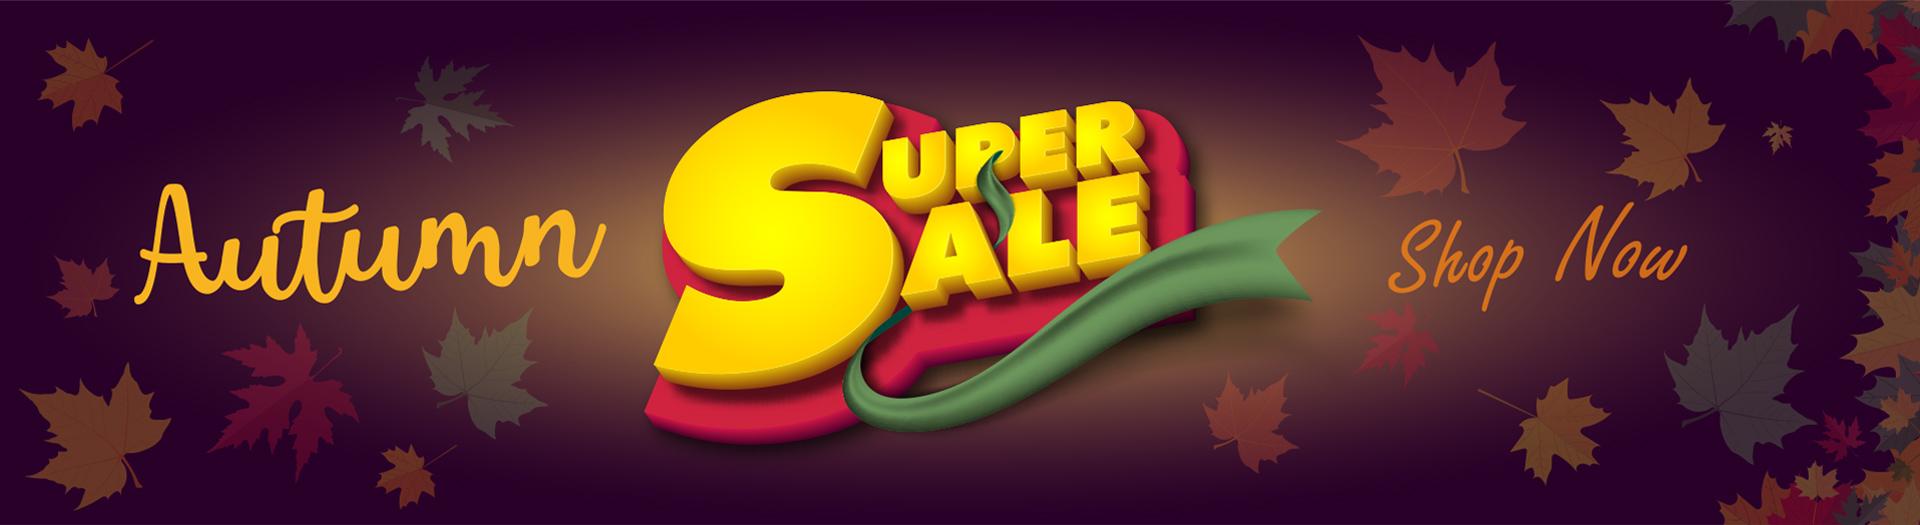 Autumn Super Sale